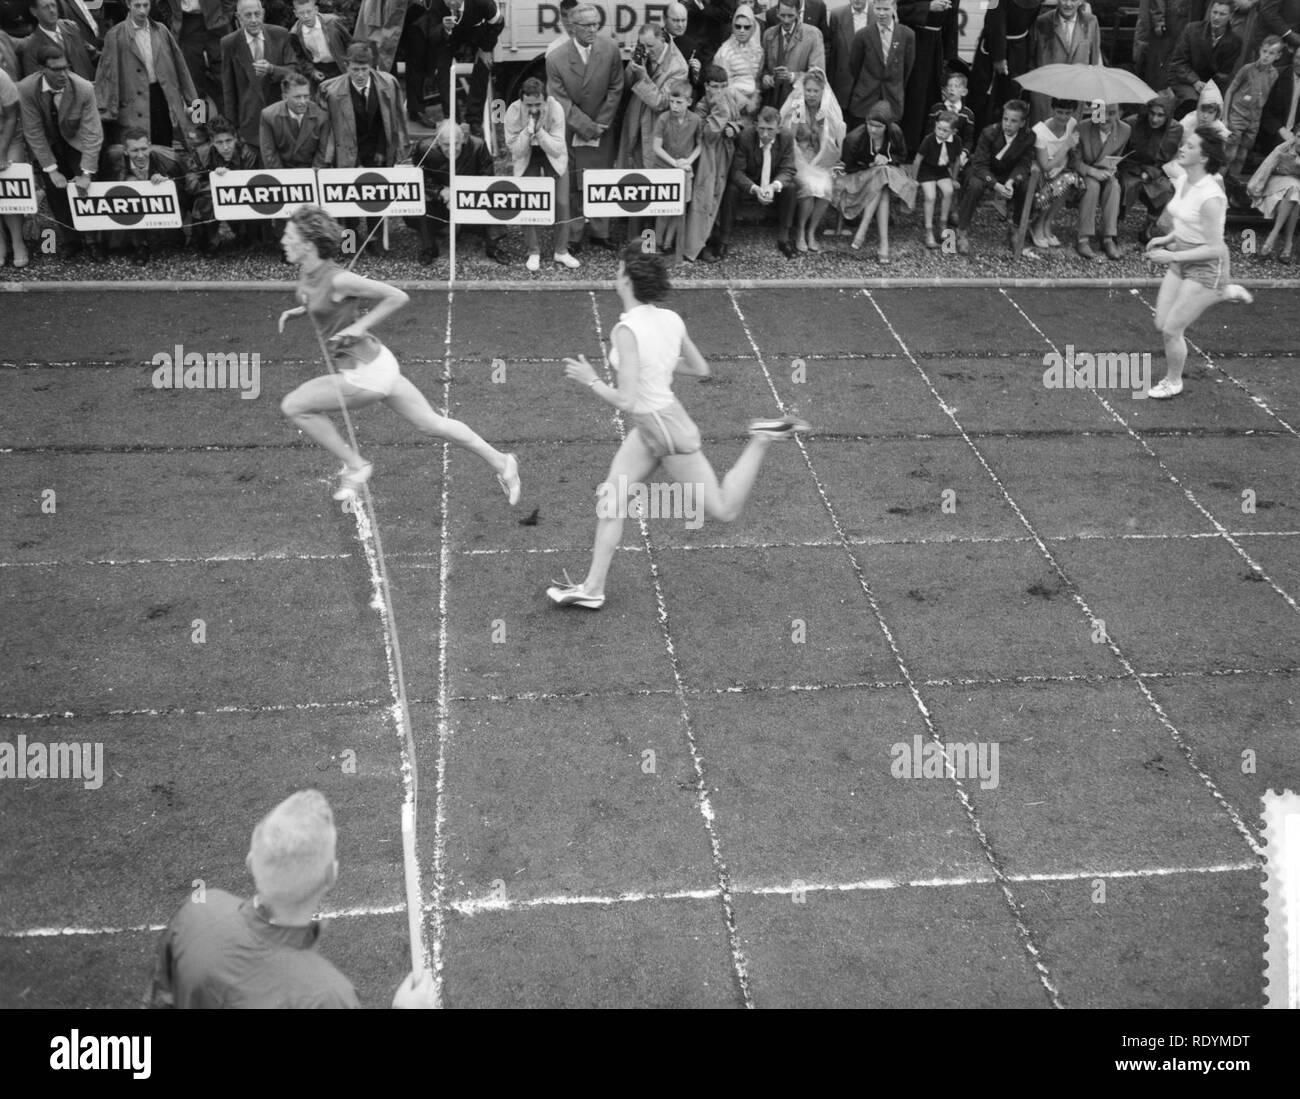 Athletiekwedstrijden dames Nederland tegen Italie te Maastricht, finish 100m mej, Bestanddeelnr 910-4583. - Stock Image